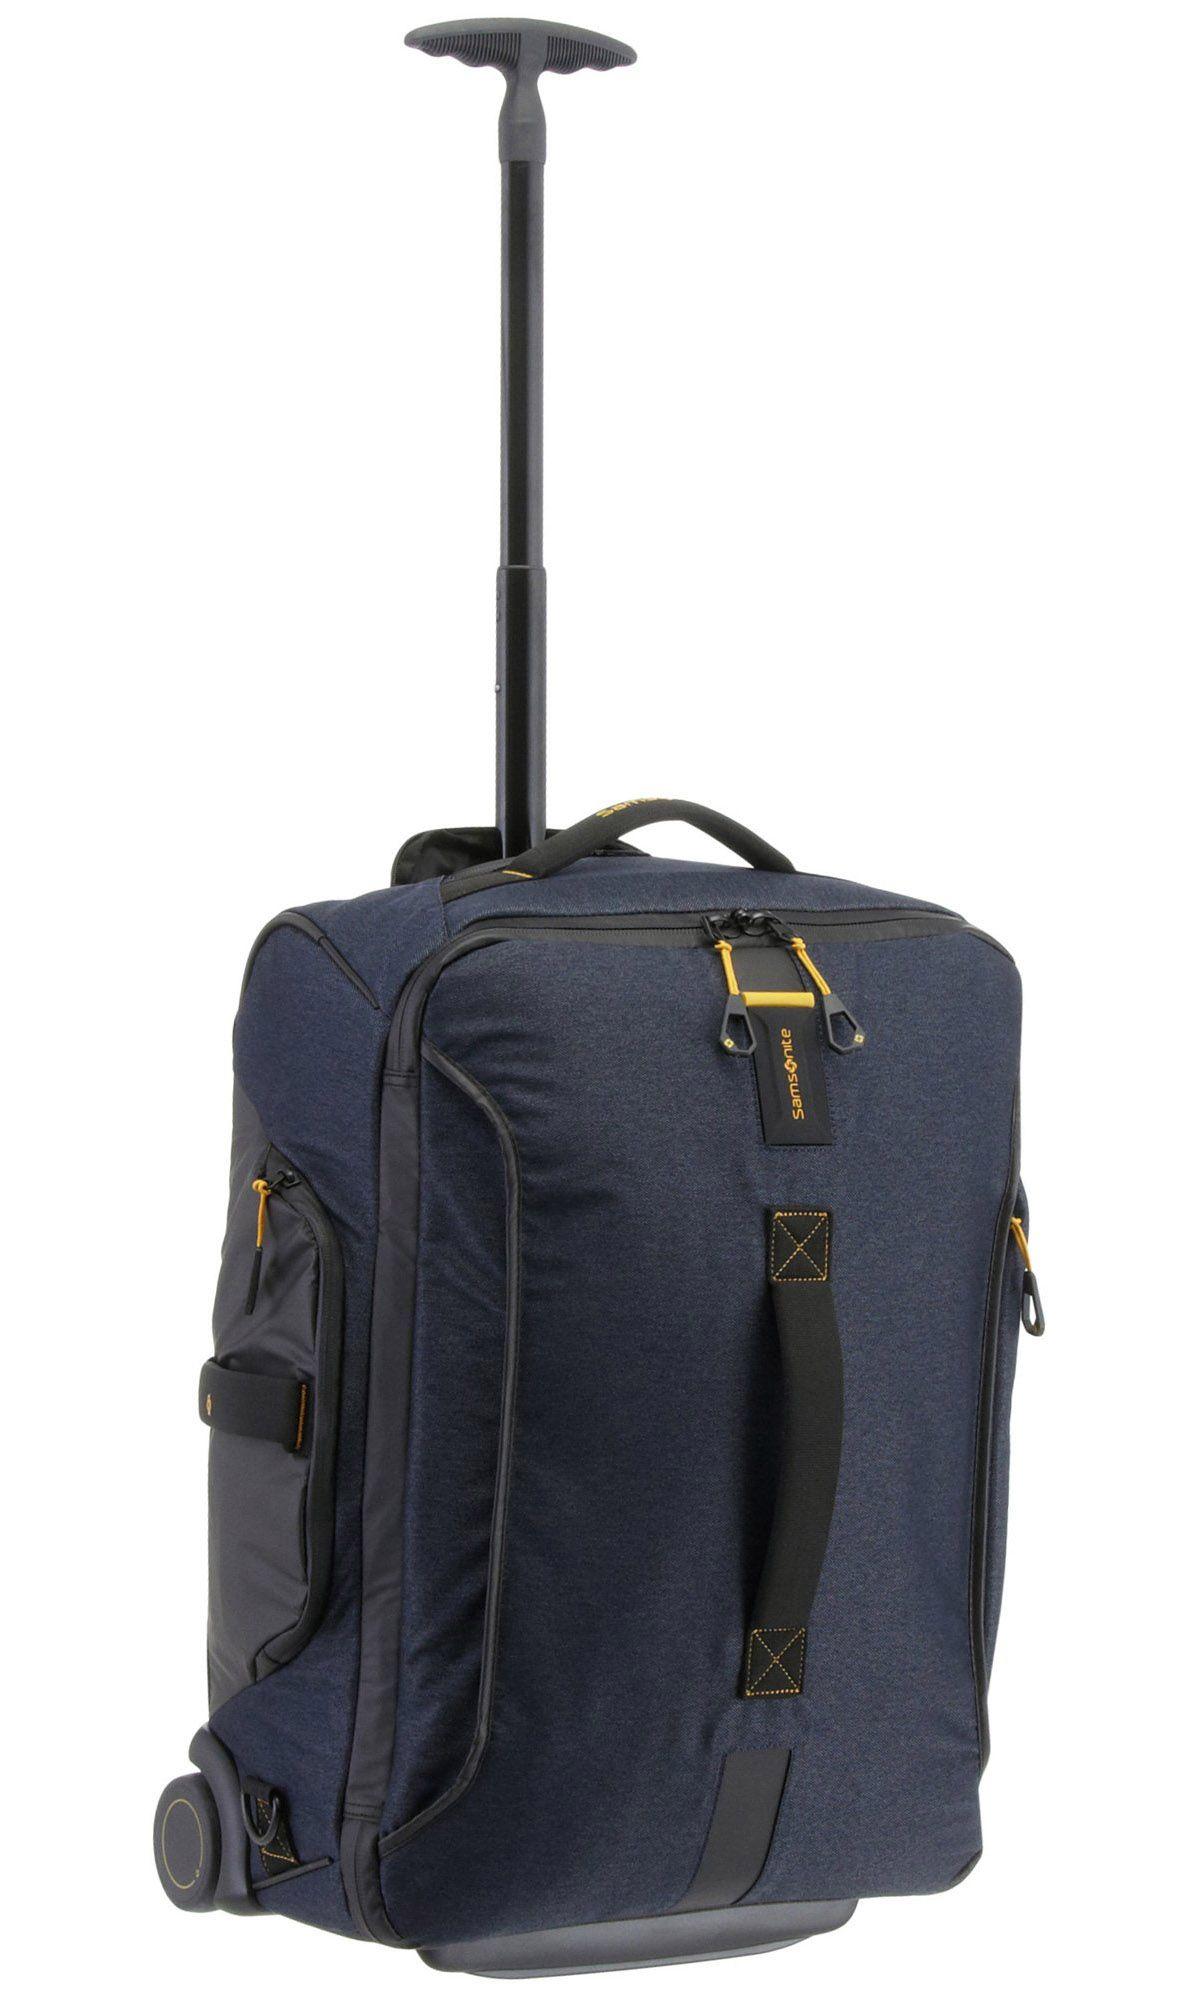 ec58c327a405 Дорожная сумка-рюкзак Samsonite 01N*008 Paradiver Light Duffle Backpack 55  см